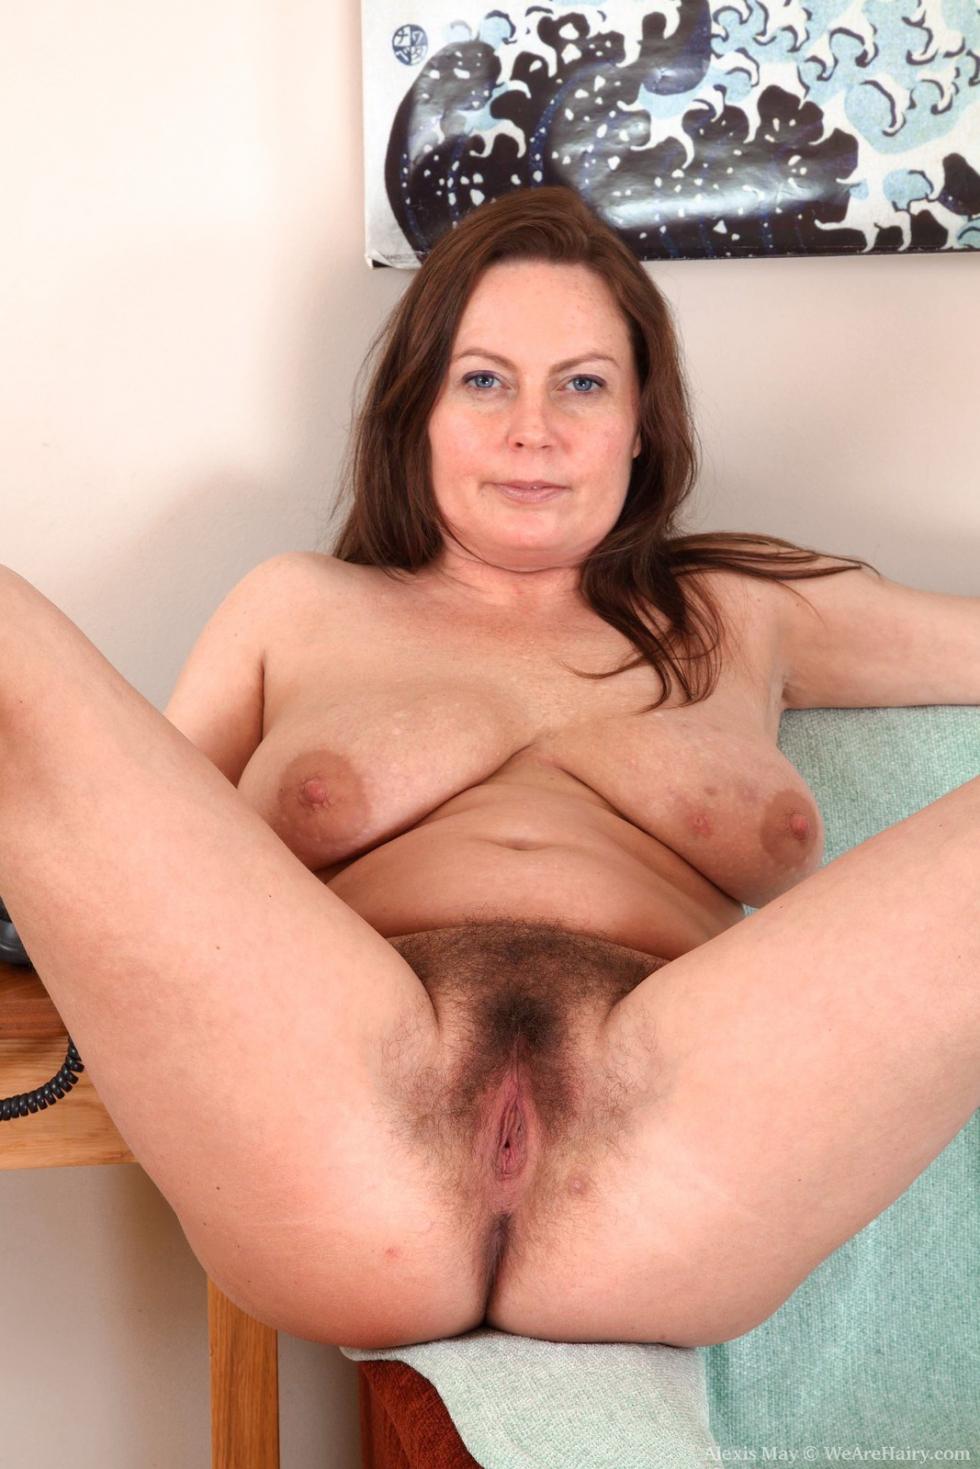 hot star wars girls nude